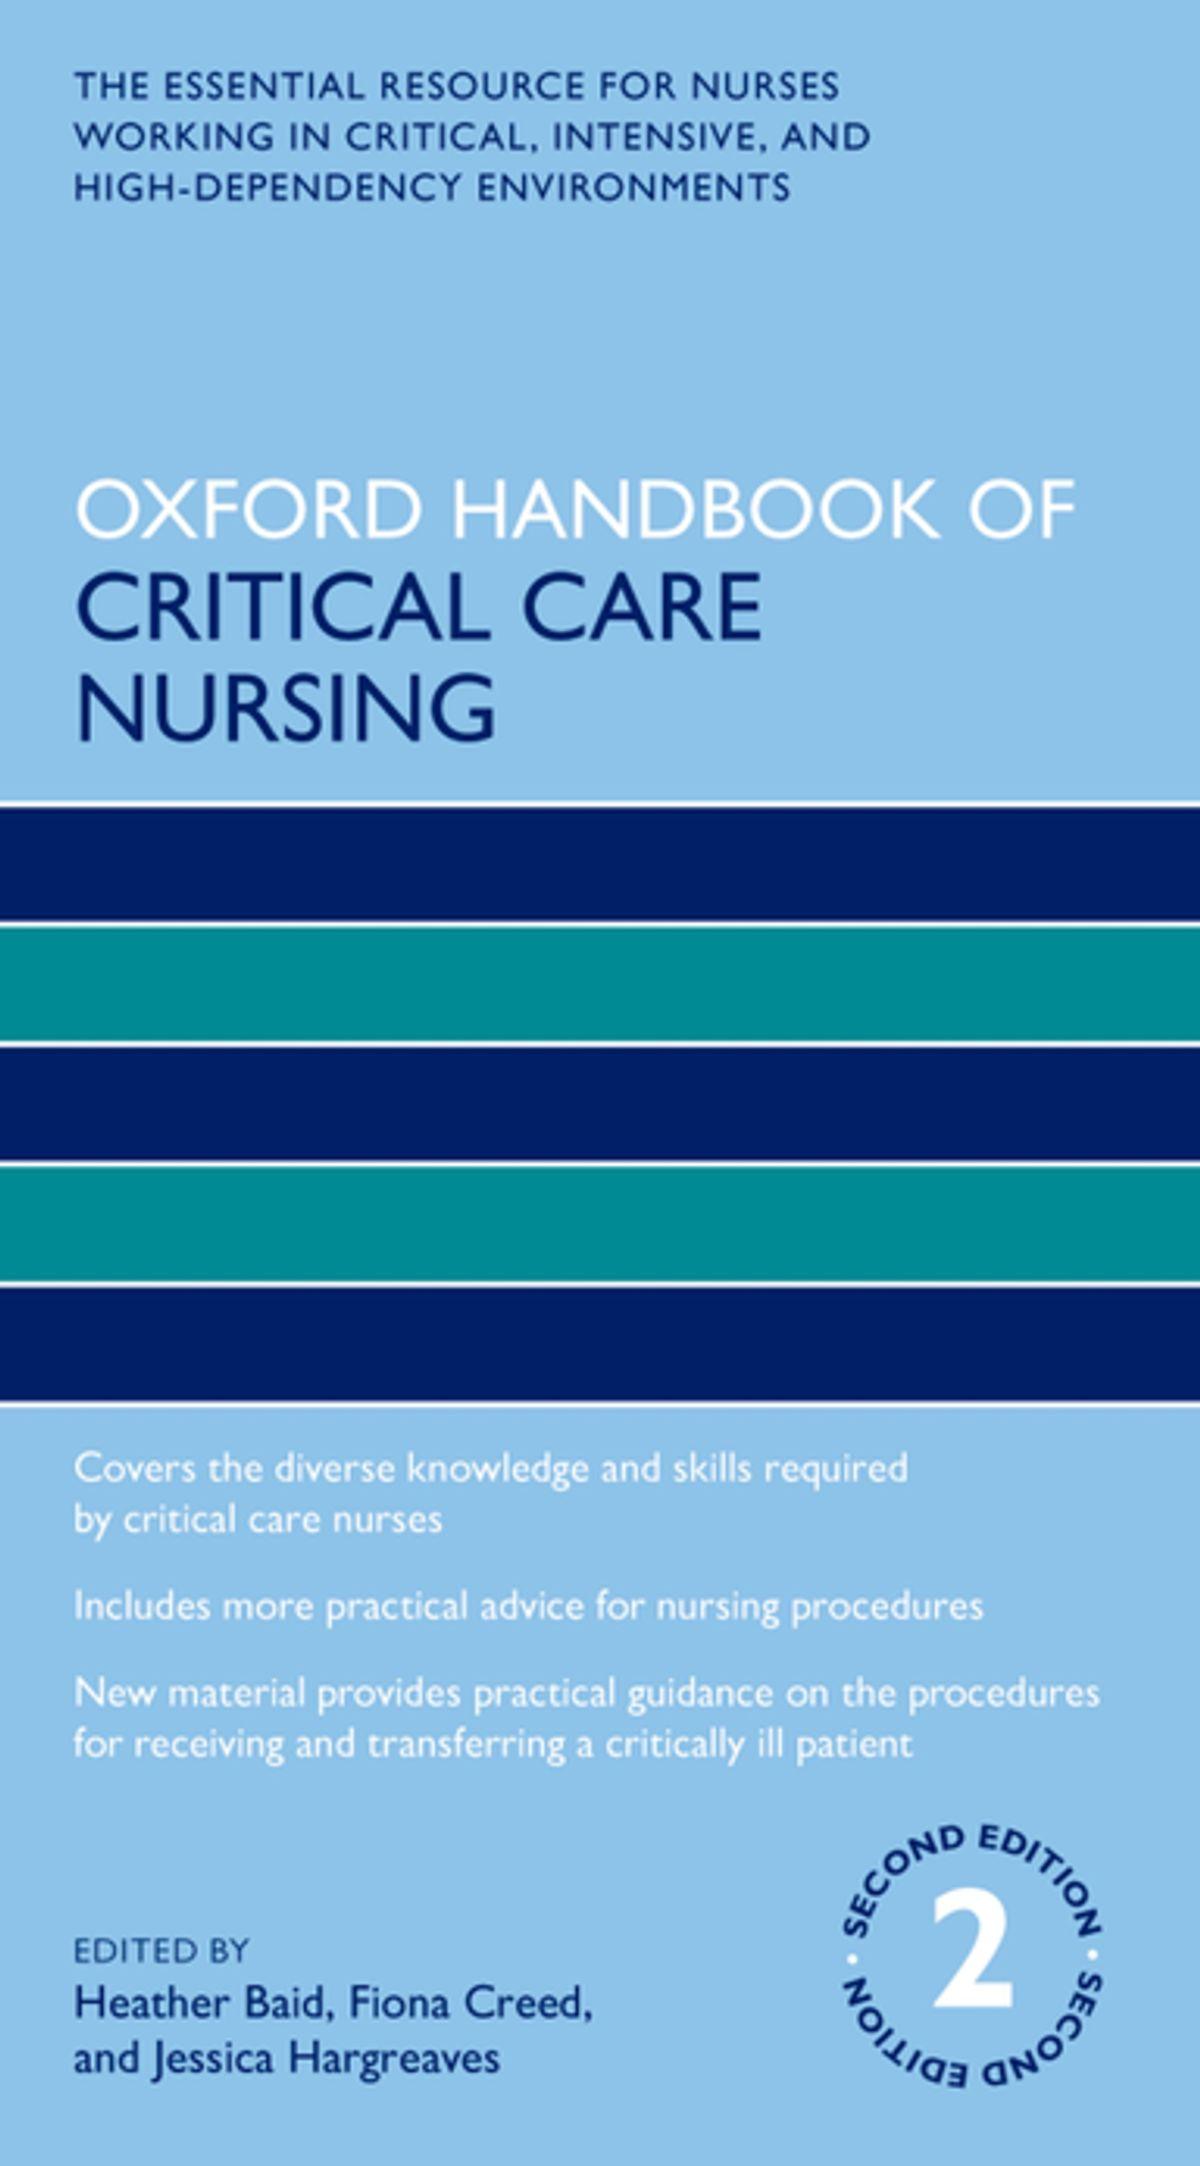 Oxford handbook of critical care nursing [electronic resource]